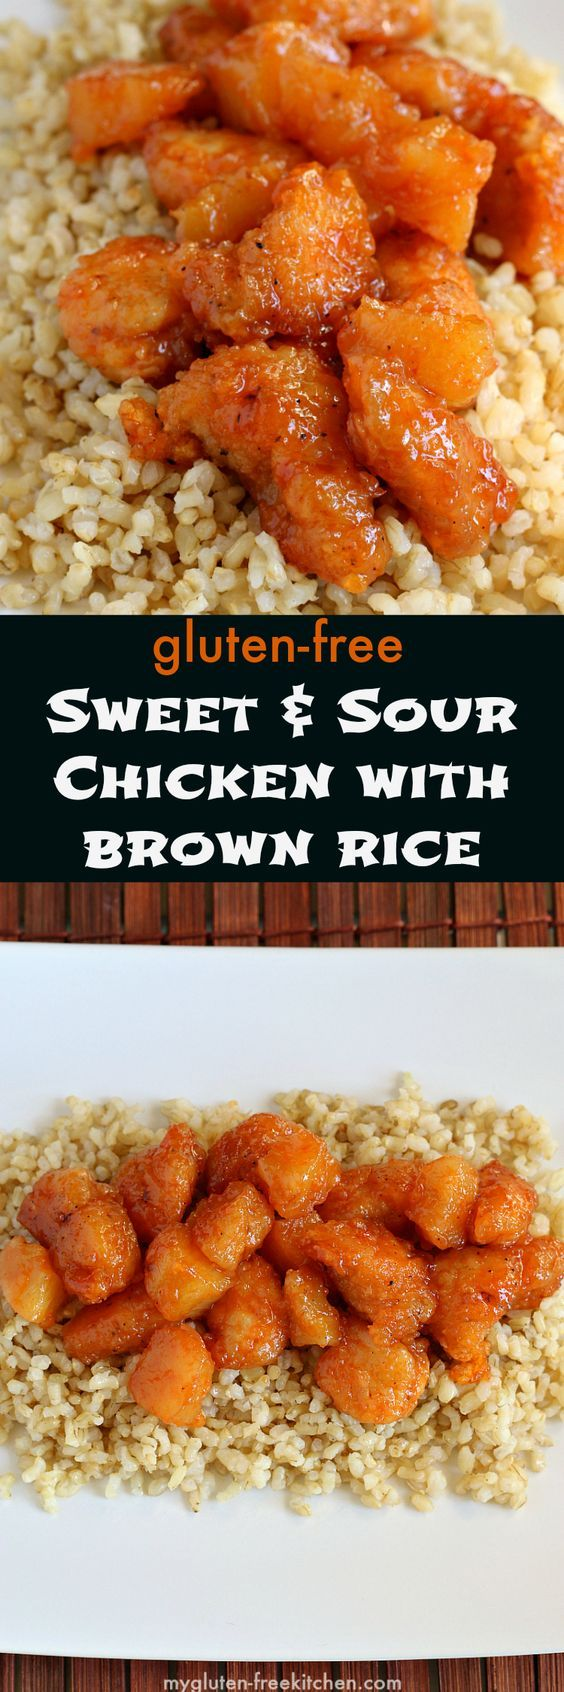 Sweet and Sour Chicken (Gluten-free)